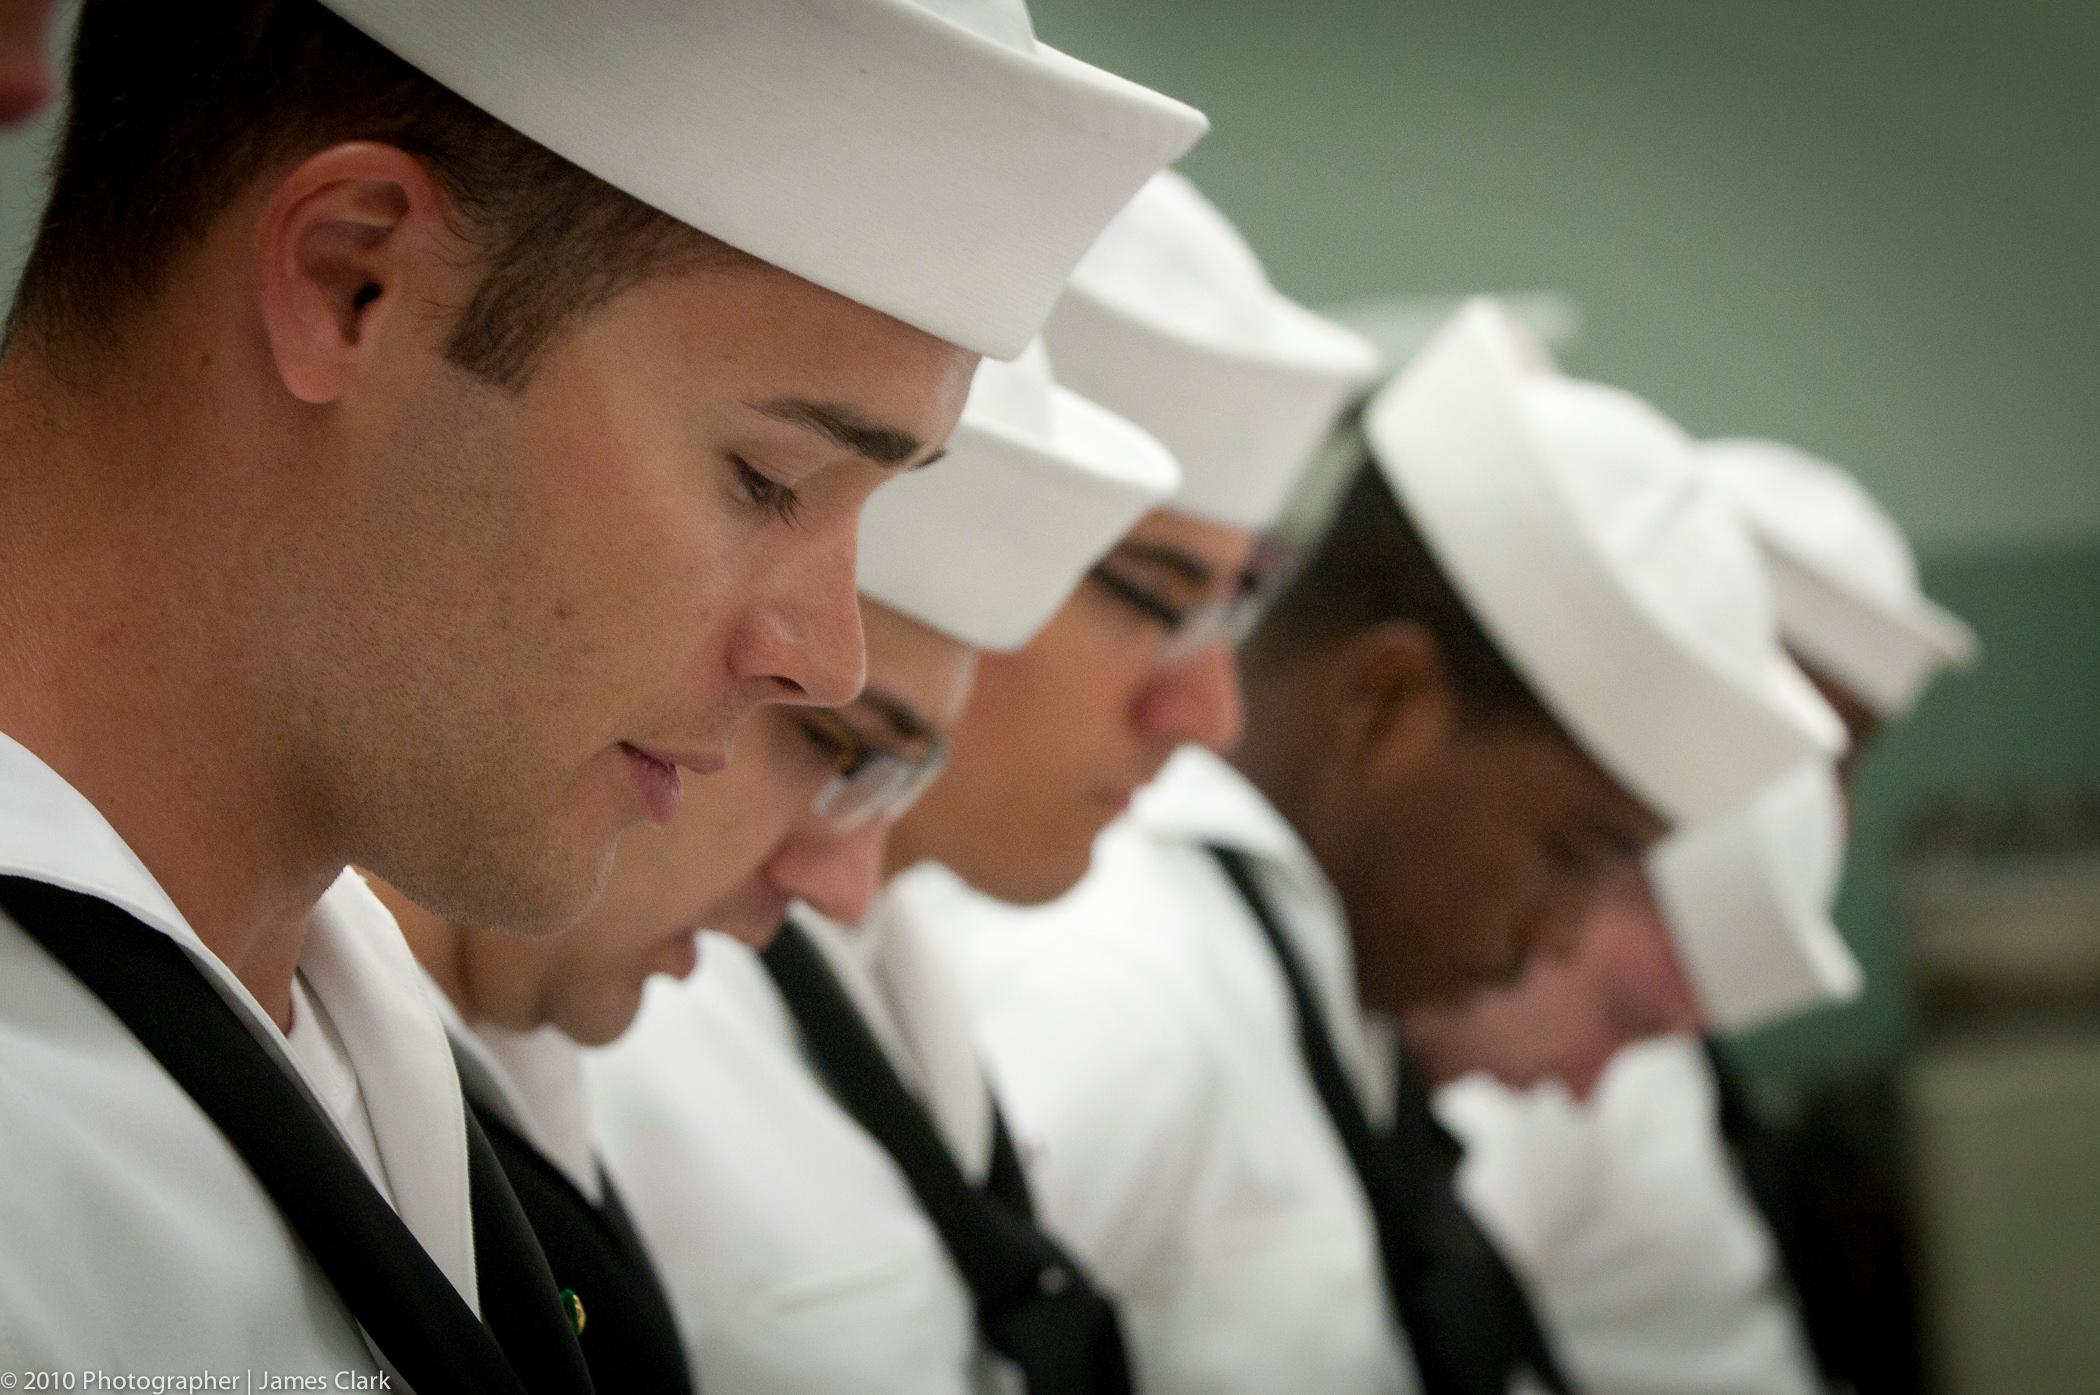 Wallpaper : white, sea, hat, dress, military, uniform, clothing, head, custom, Caucasian, sailor, event, praying, nautical, navy, ocean, man, cap, anchor, ...